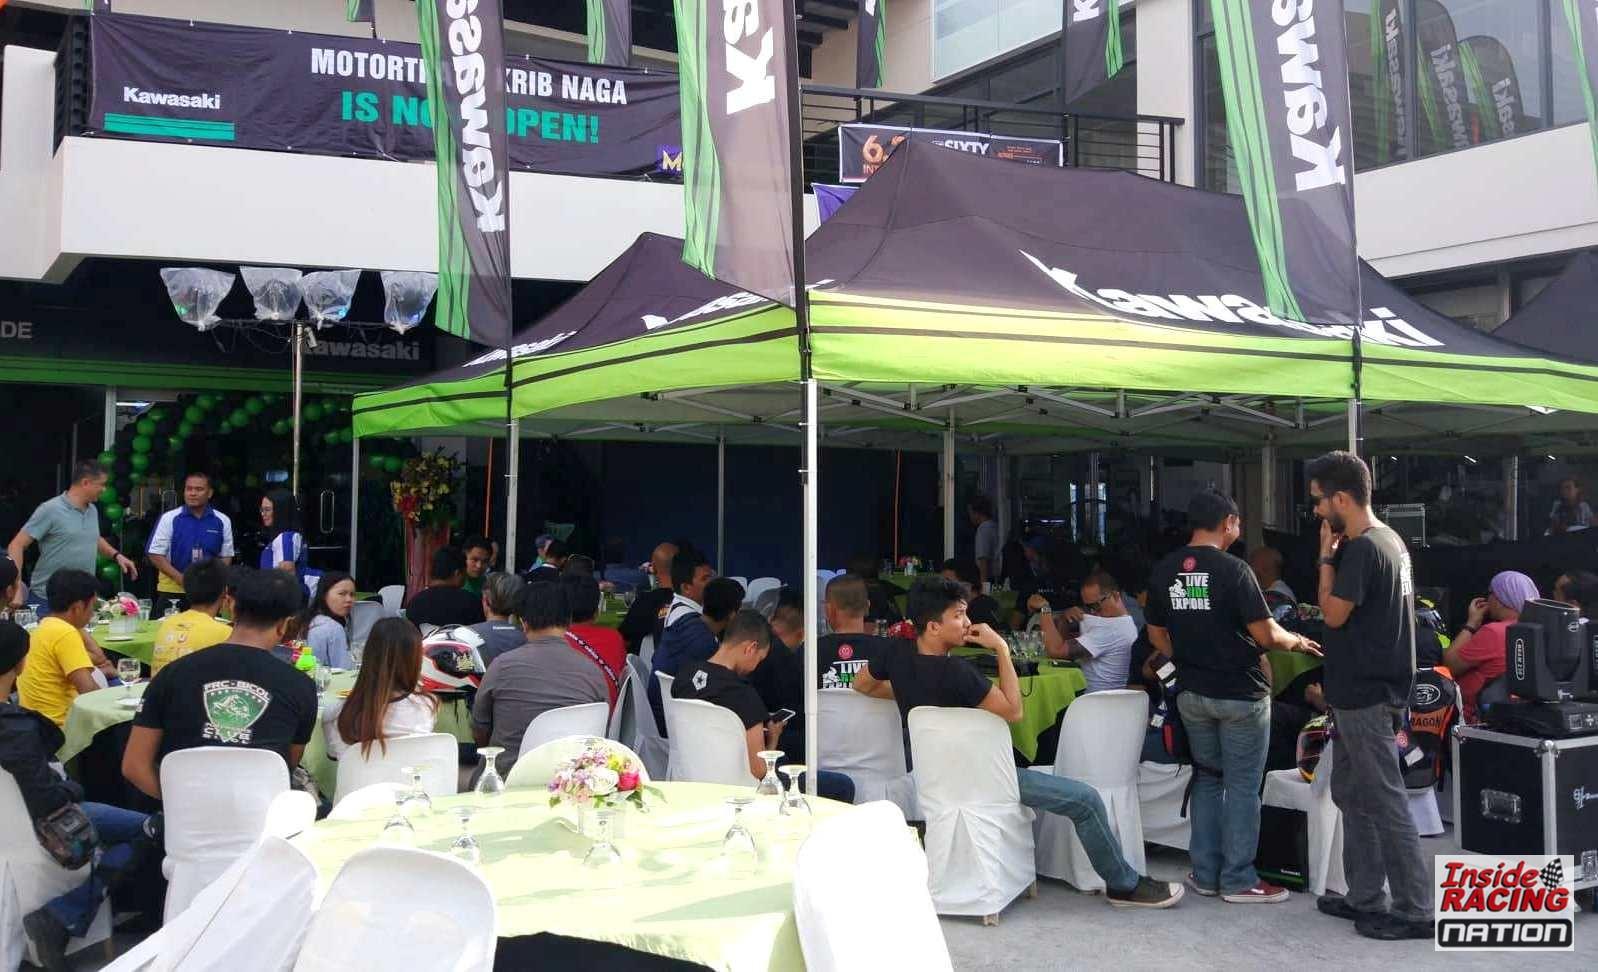 Kawasaki Big Bikes Store Opened by Motortrade in Bicol